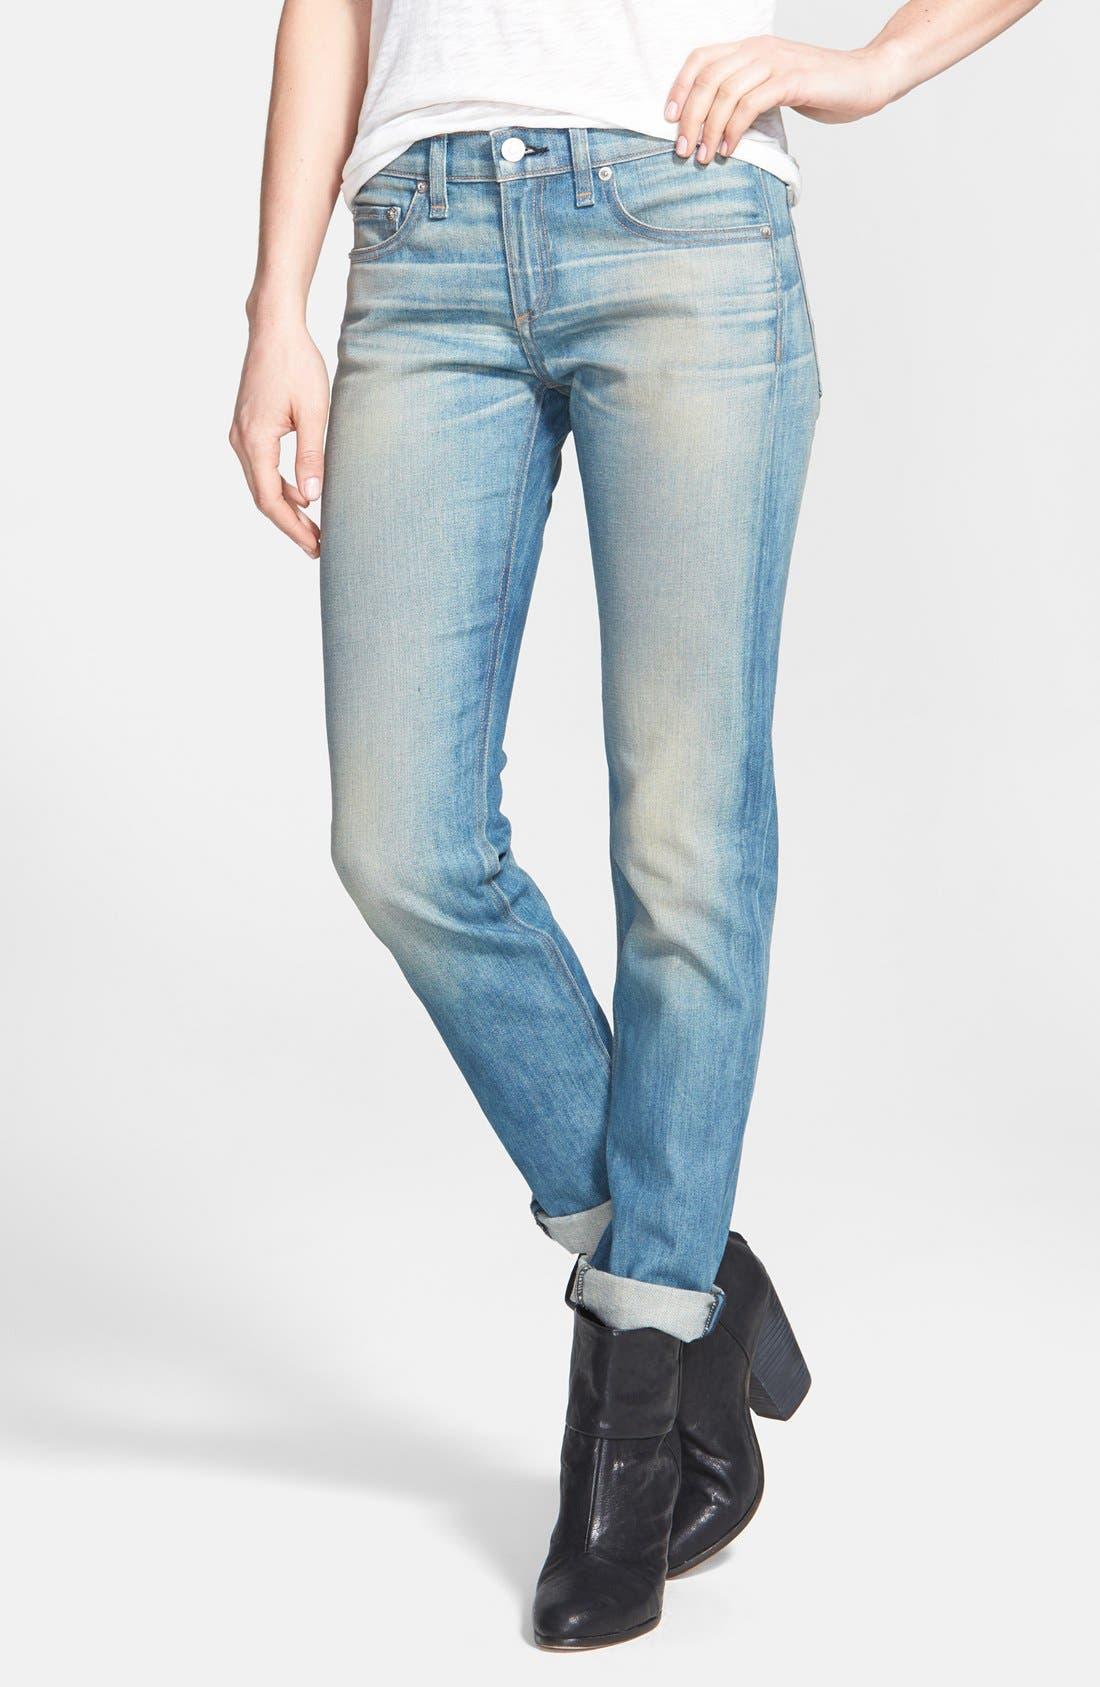 Main Image - rag & bone/JEAN 'The Dre' Slim Fit Boyfriend Jeans (Greencast)